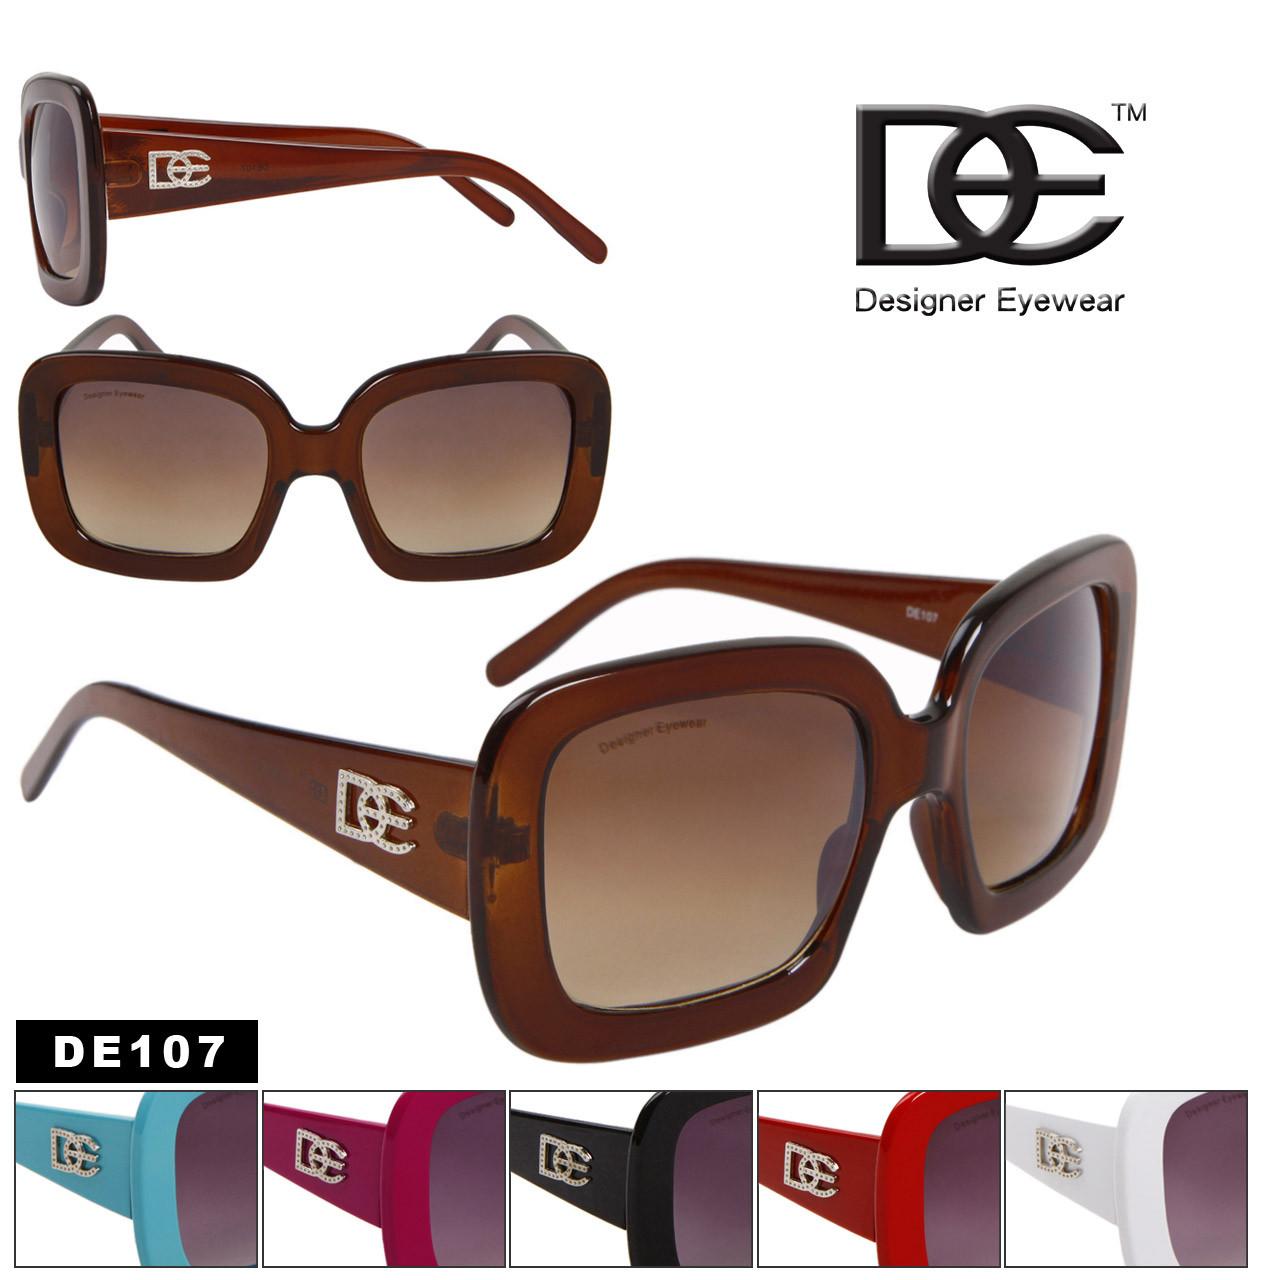 Designer Eyewear Fashion Sunglasses DE107